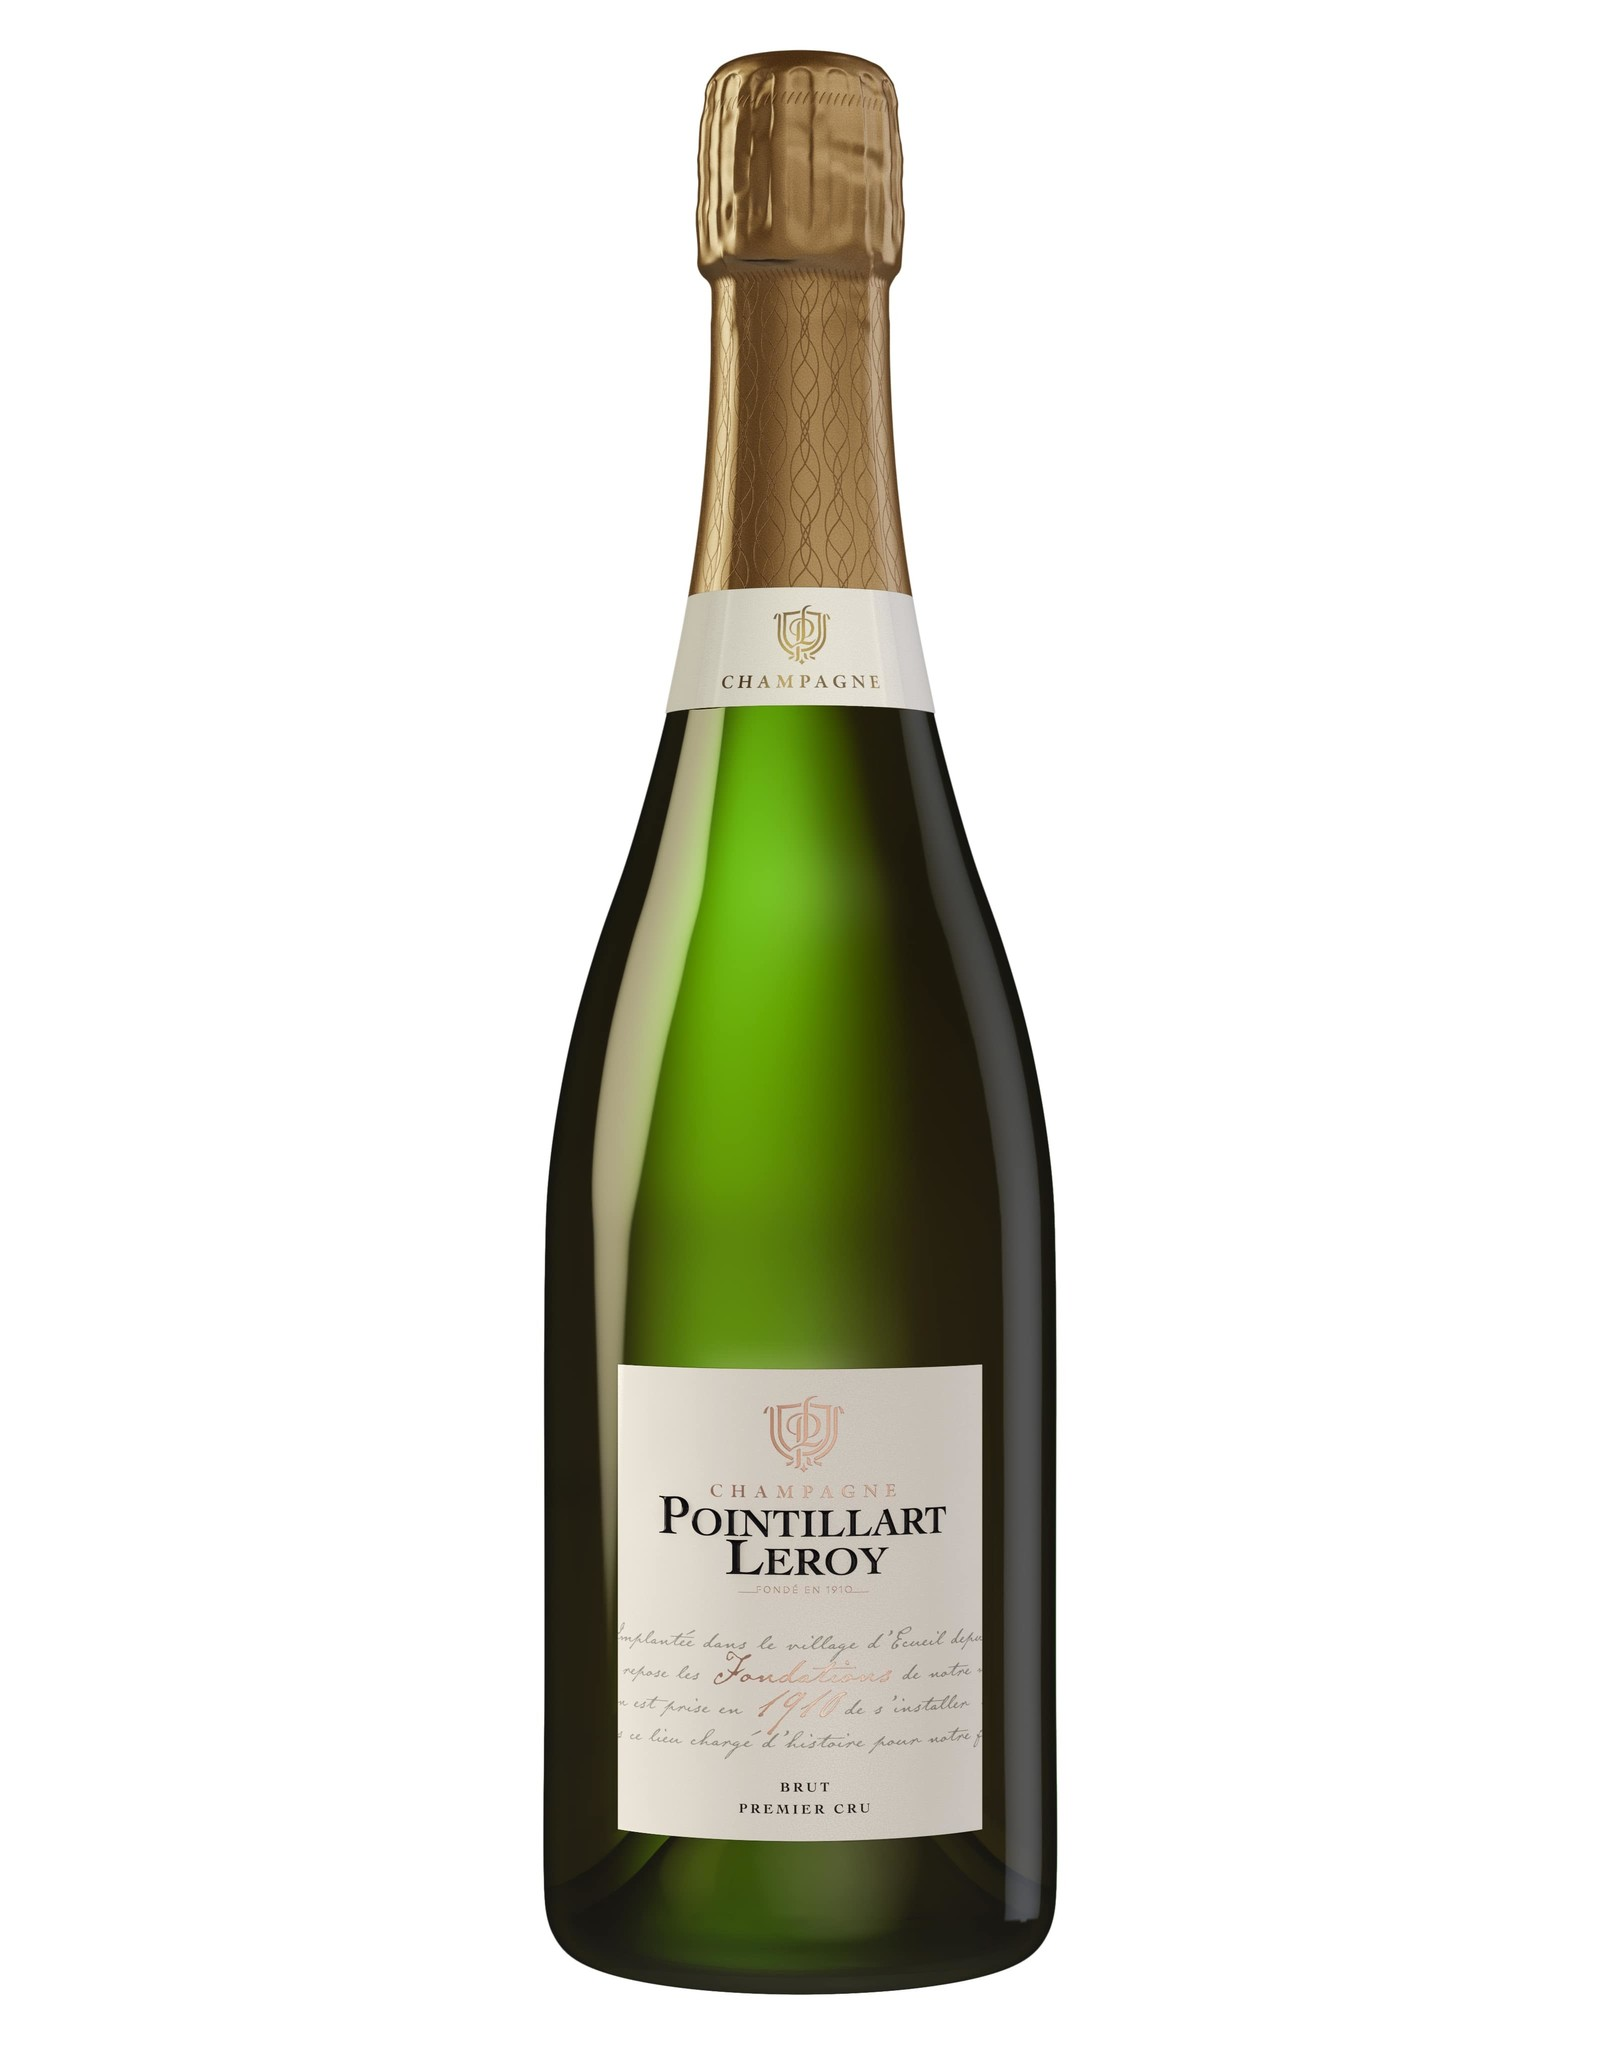 "Pointillart Leroy Pointillart-Leroy Champagne Brut Premier Cru ""Fondations 1910"""